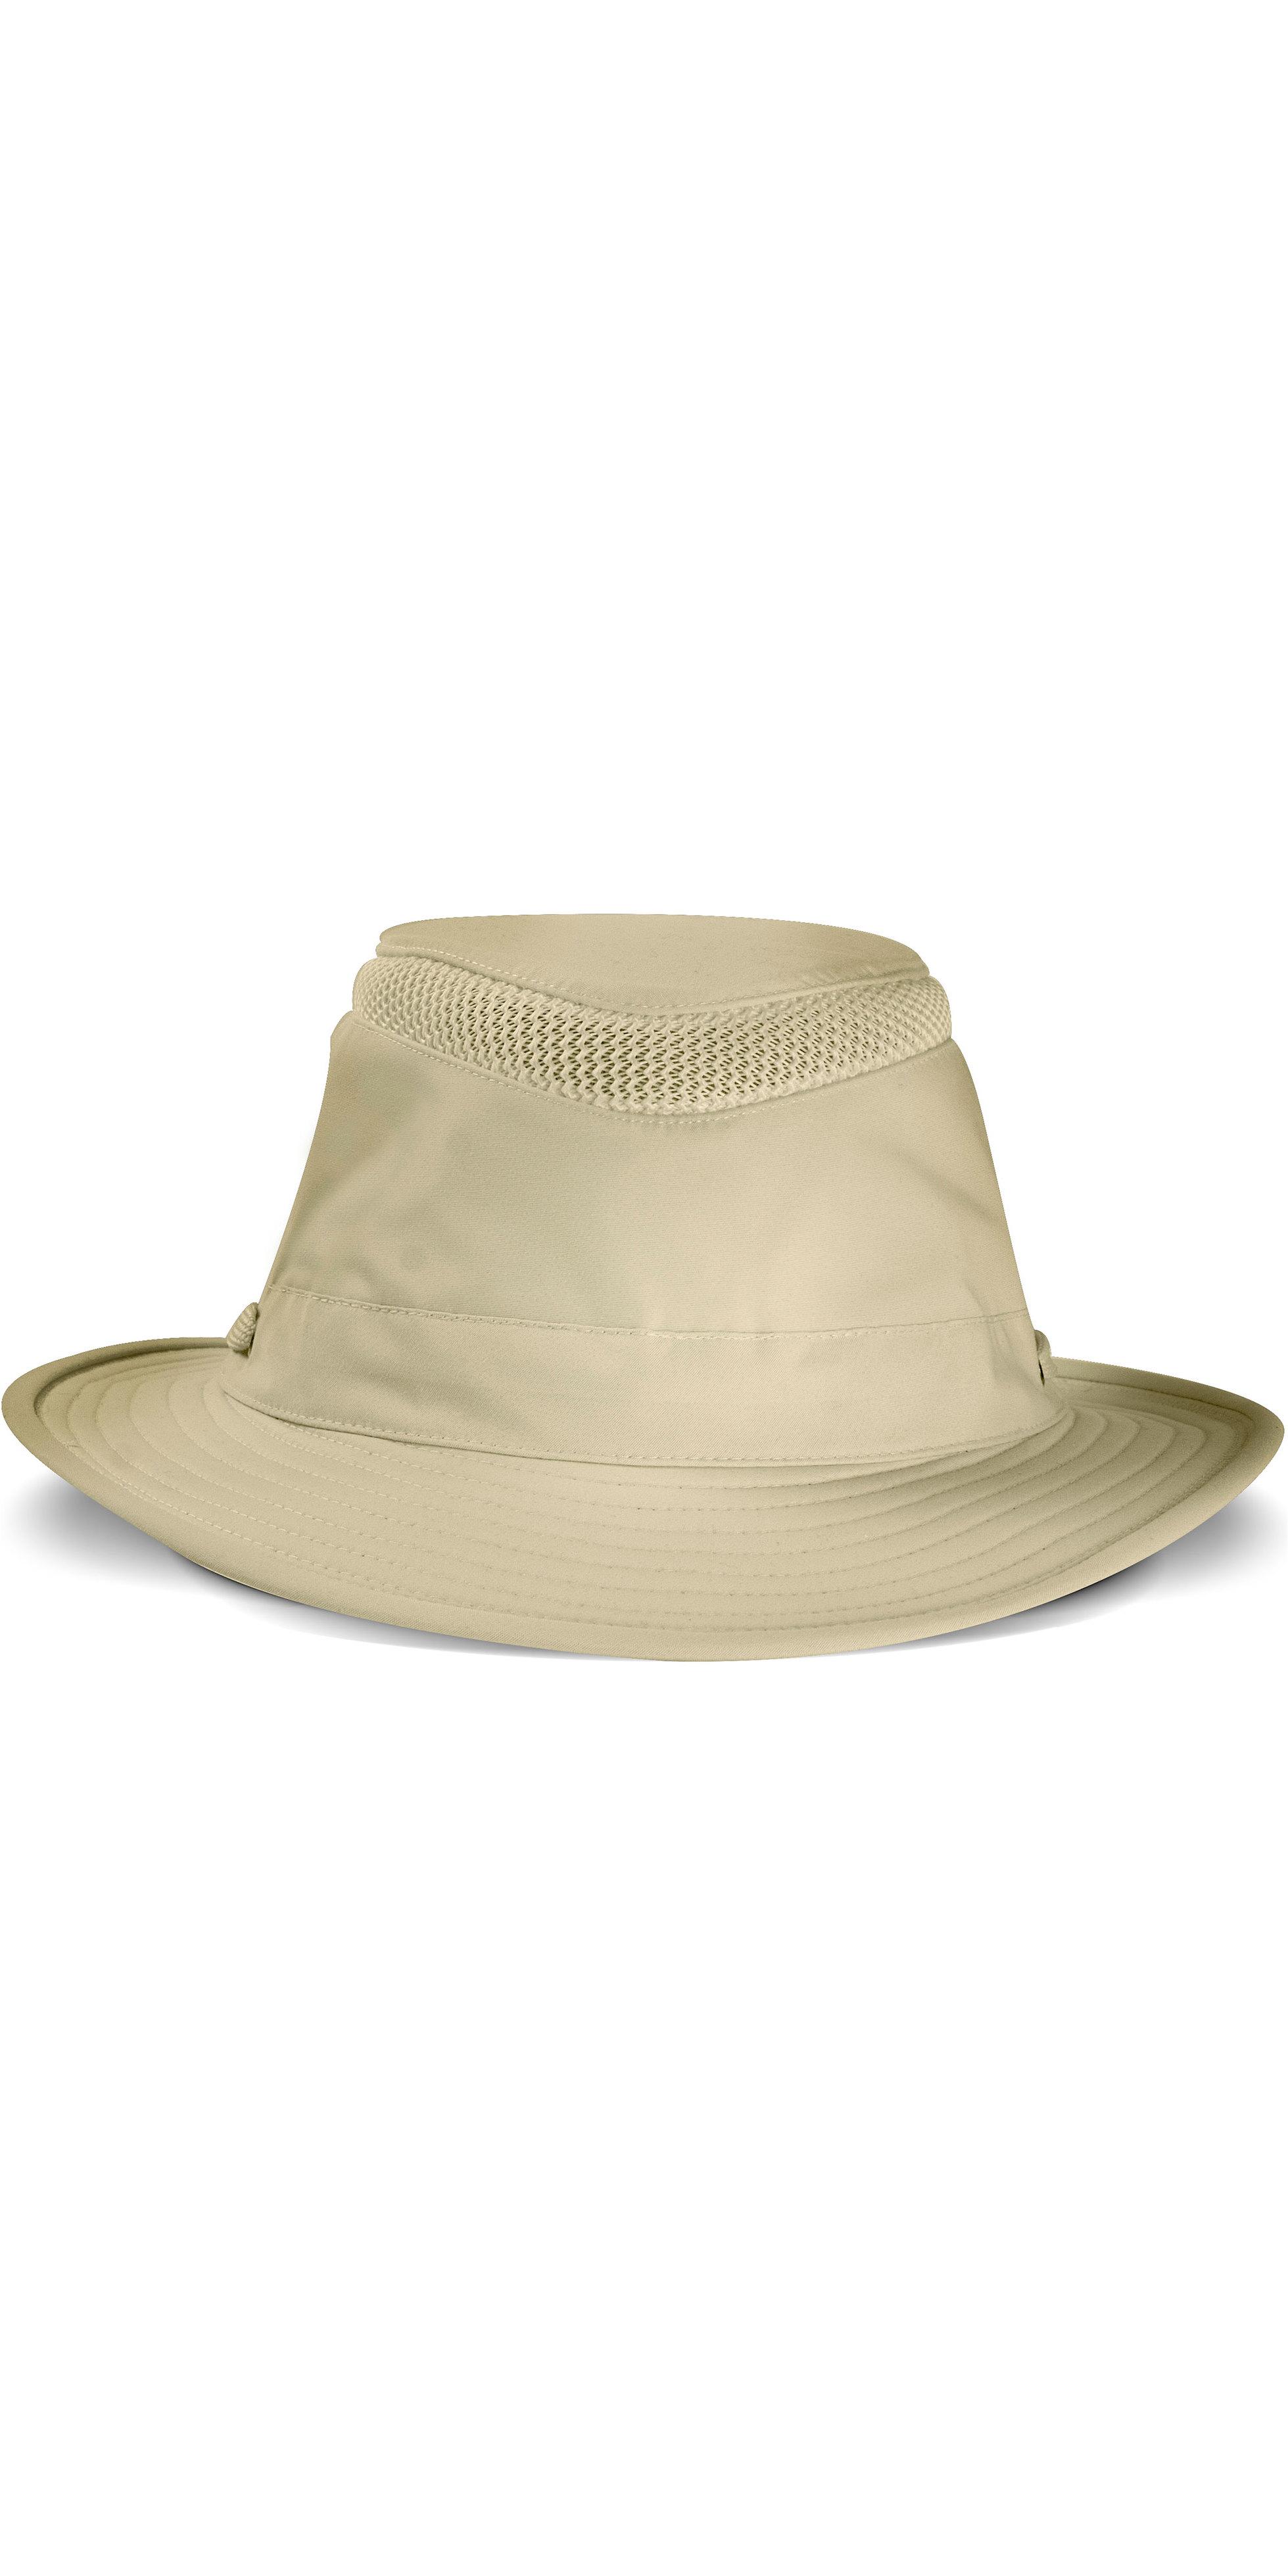 2019 Tilley Ltm5 Airflo Brimmed Hat Khaki - Ltm5 - Technical Hats ... 6bb40d0d8a4